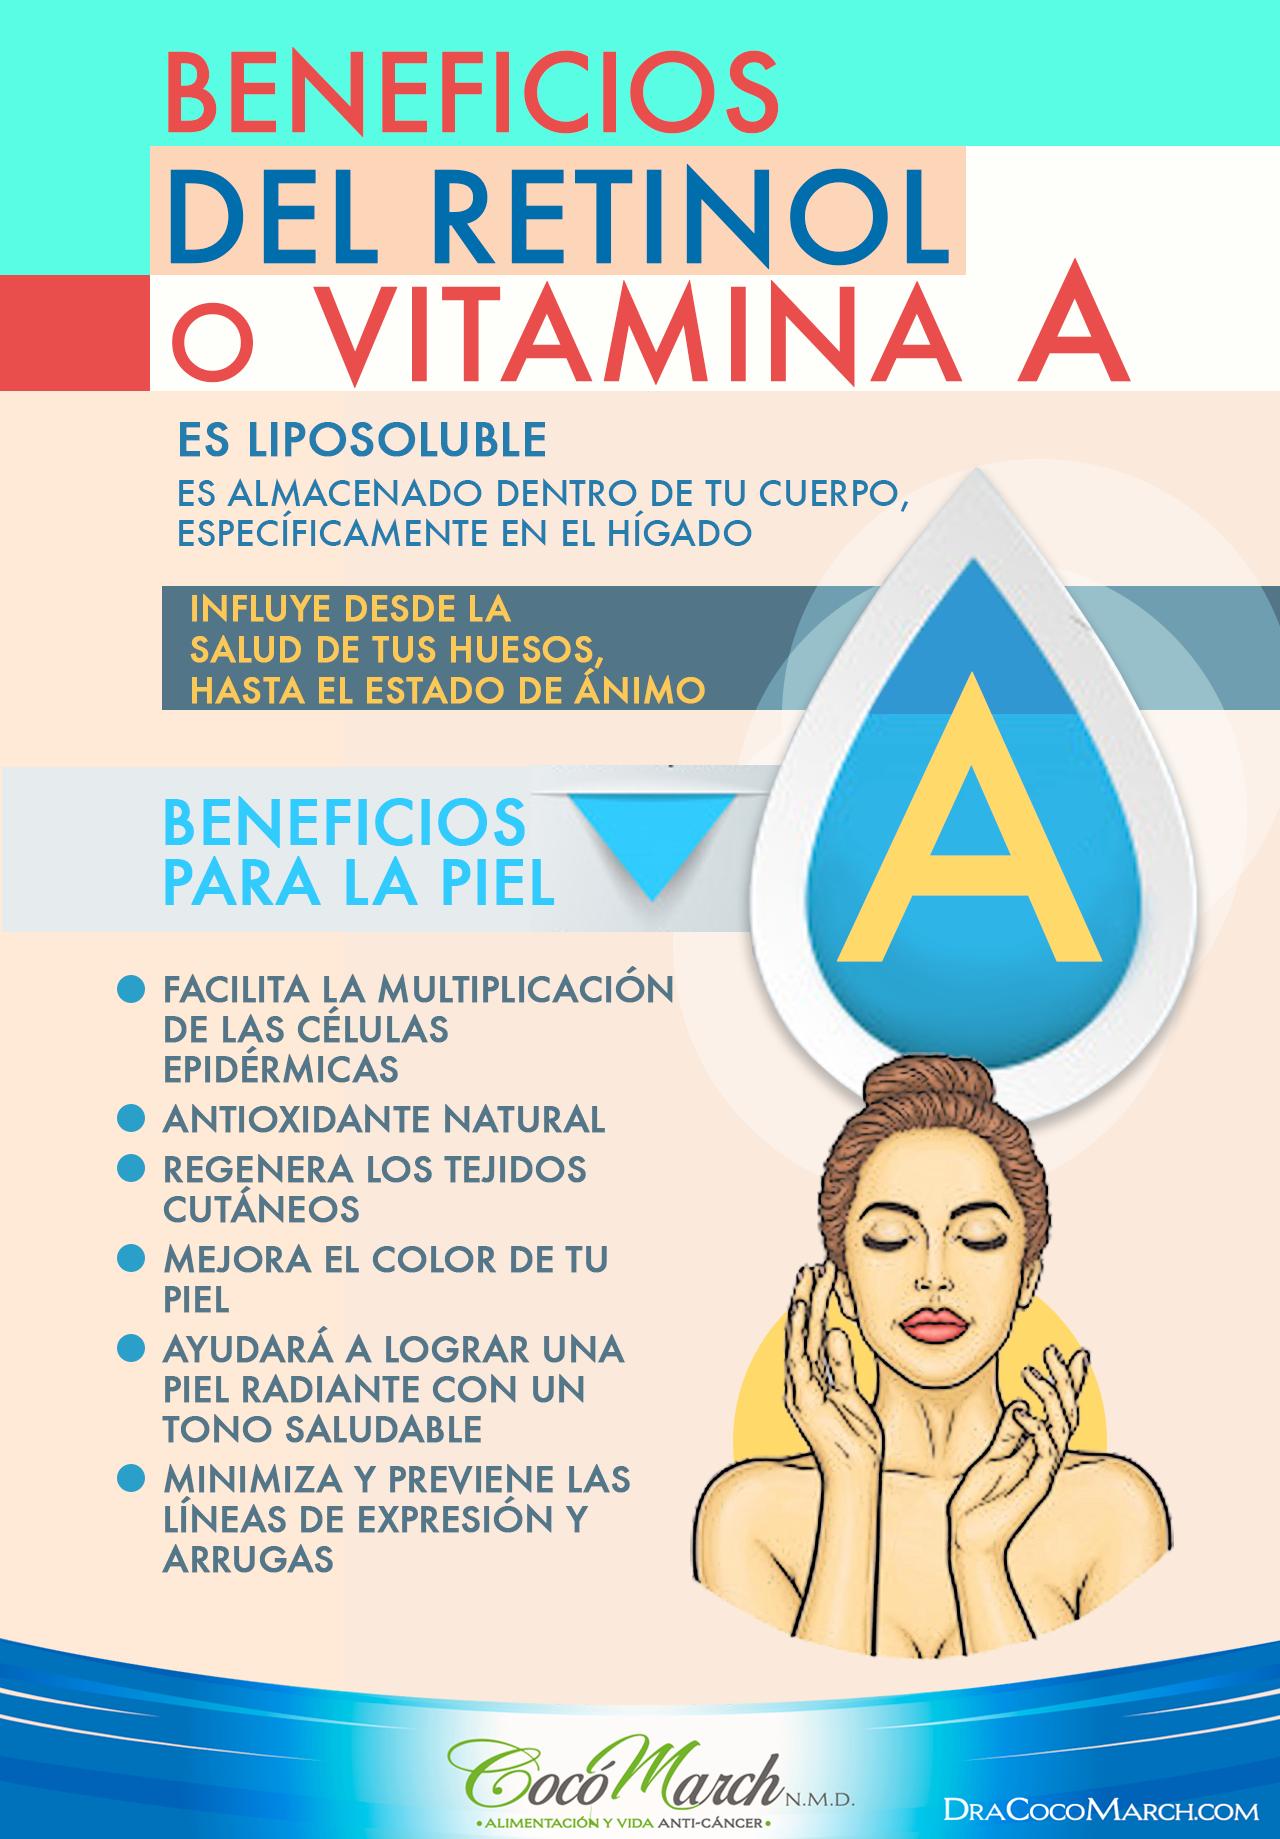 beneficios-del-retinol-o-vitamina-a